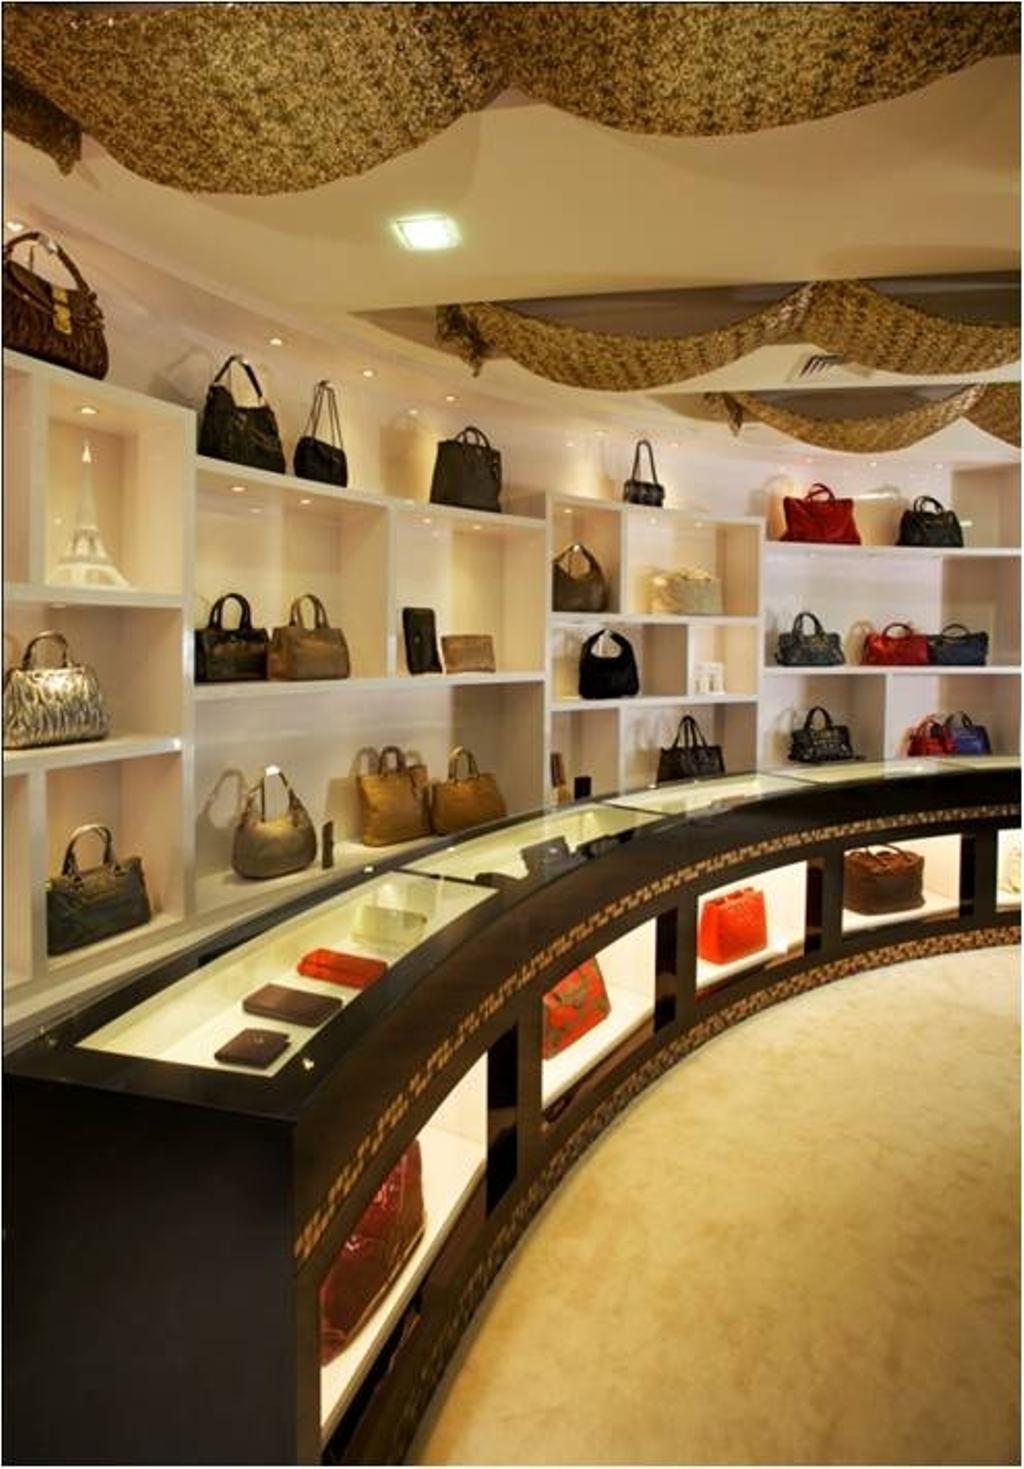 The Luxury Galleria, Commercial, Interior Designer, Urban Habitat Design, Modern, Vintage, Accessories, Bag, Handbag, Purse, Shop